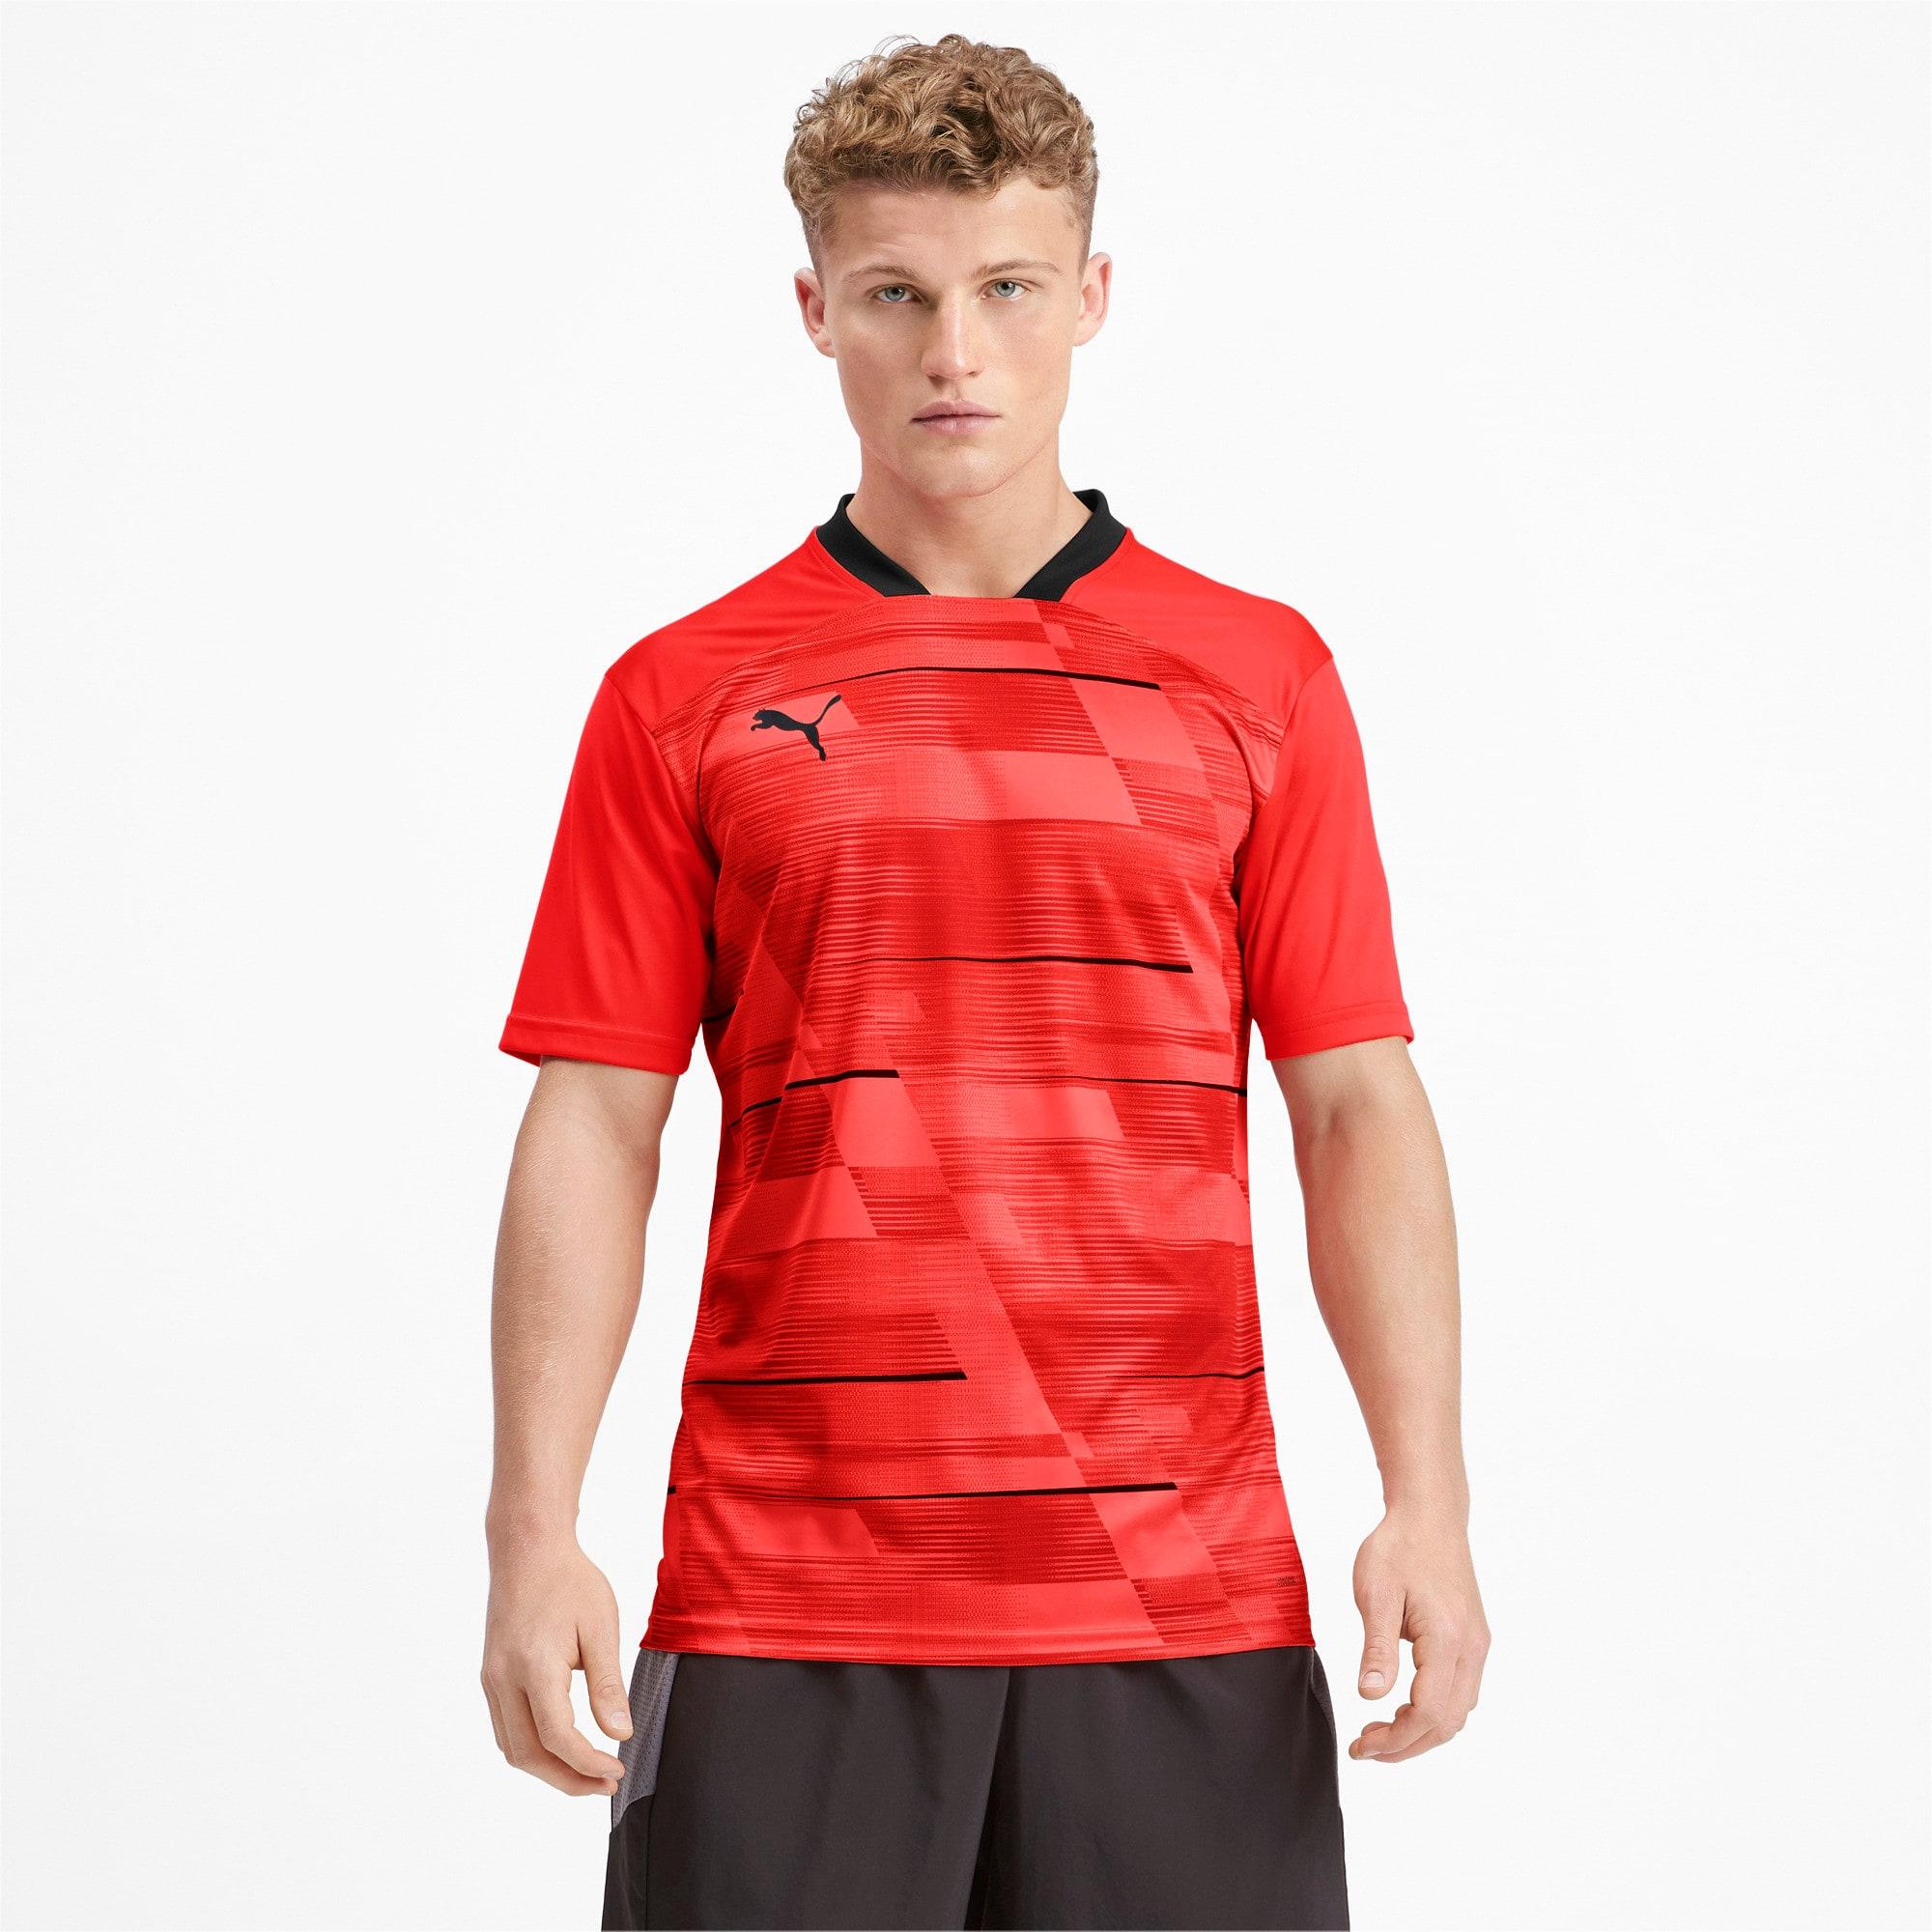 Thumbnail 1 of ftblNXT Men's Graphic Shirt, Nrgy Red-Puma Black, medium